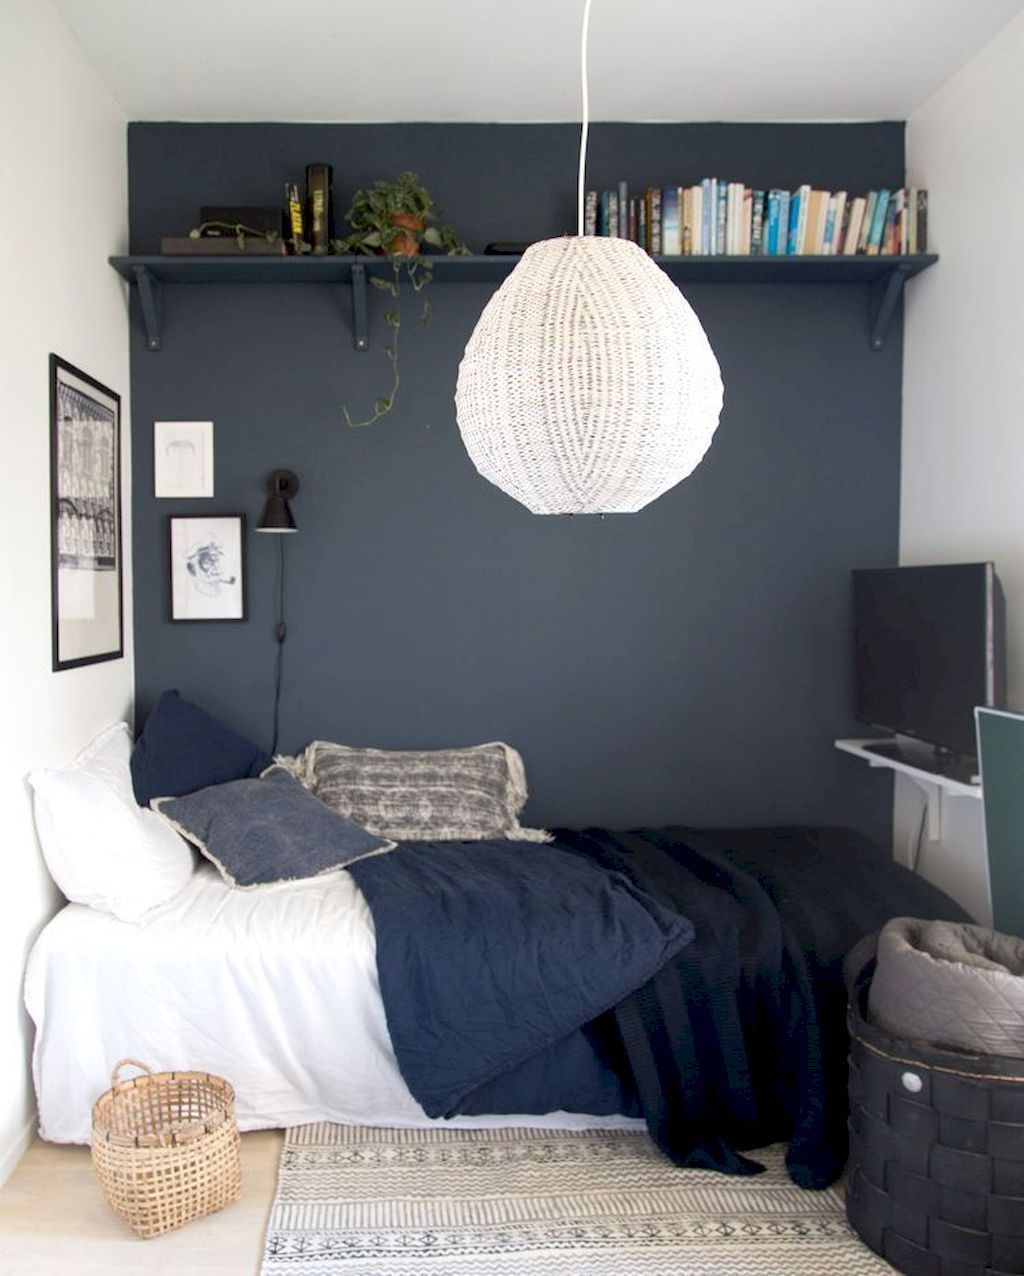 Small single bedroom design ideas